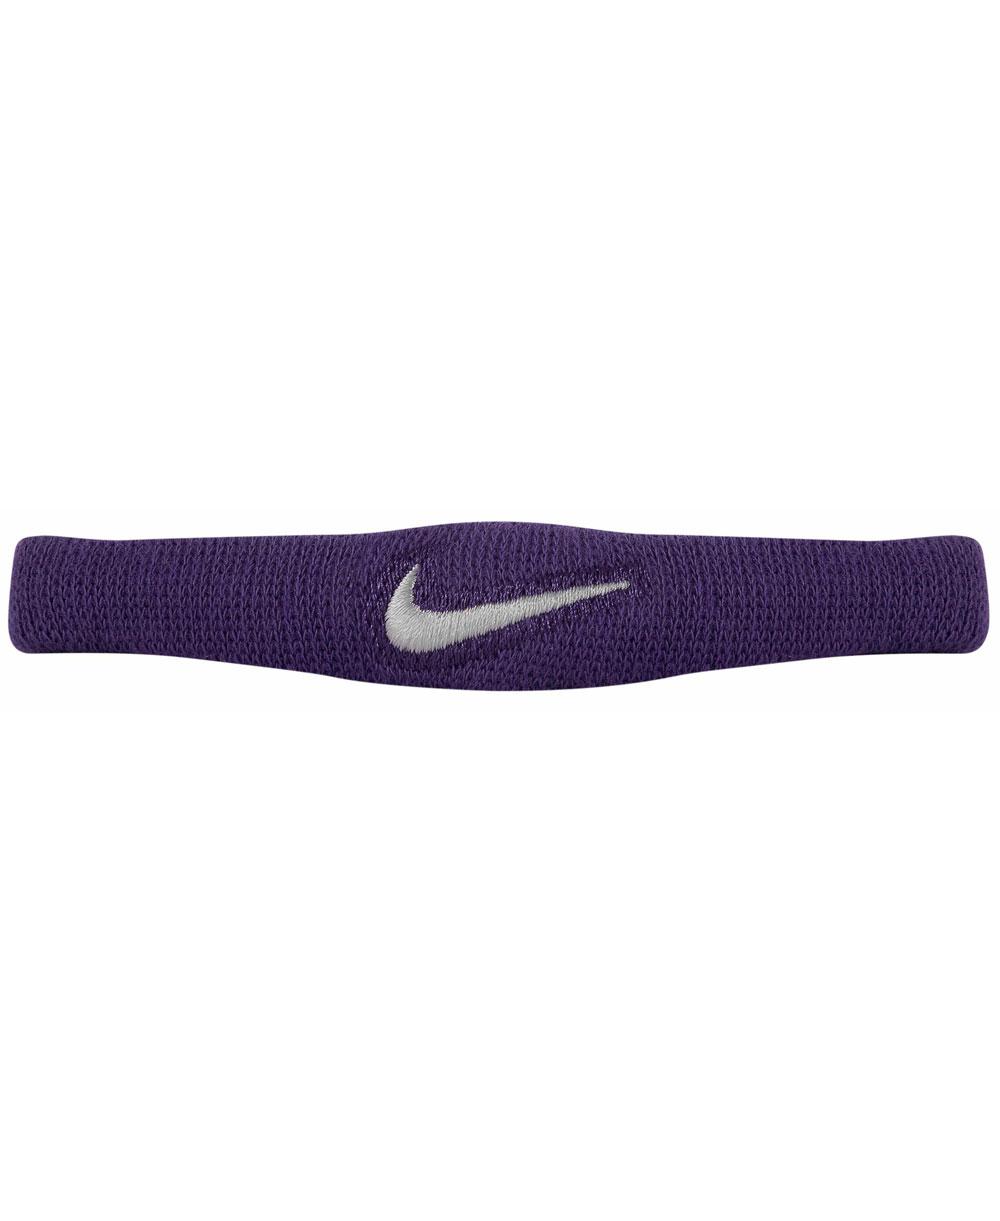 Dri-FIT Skinny Bandes Avant-bras Purple